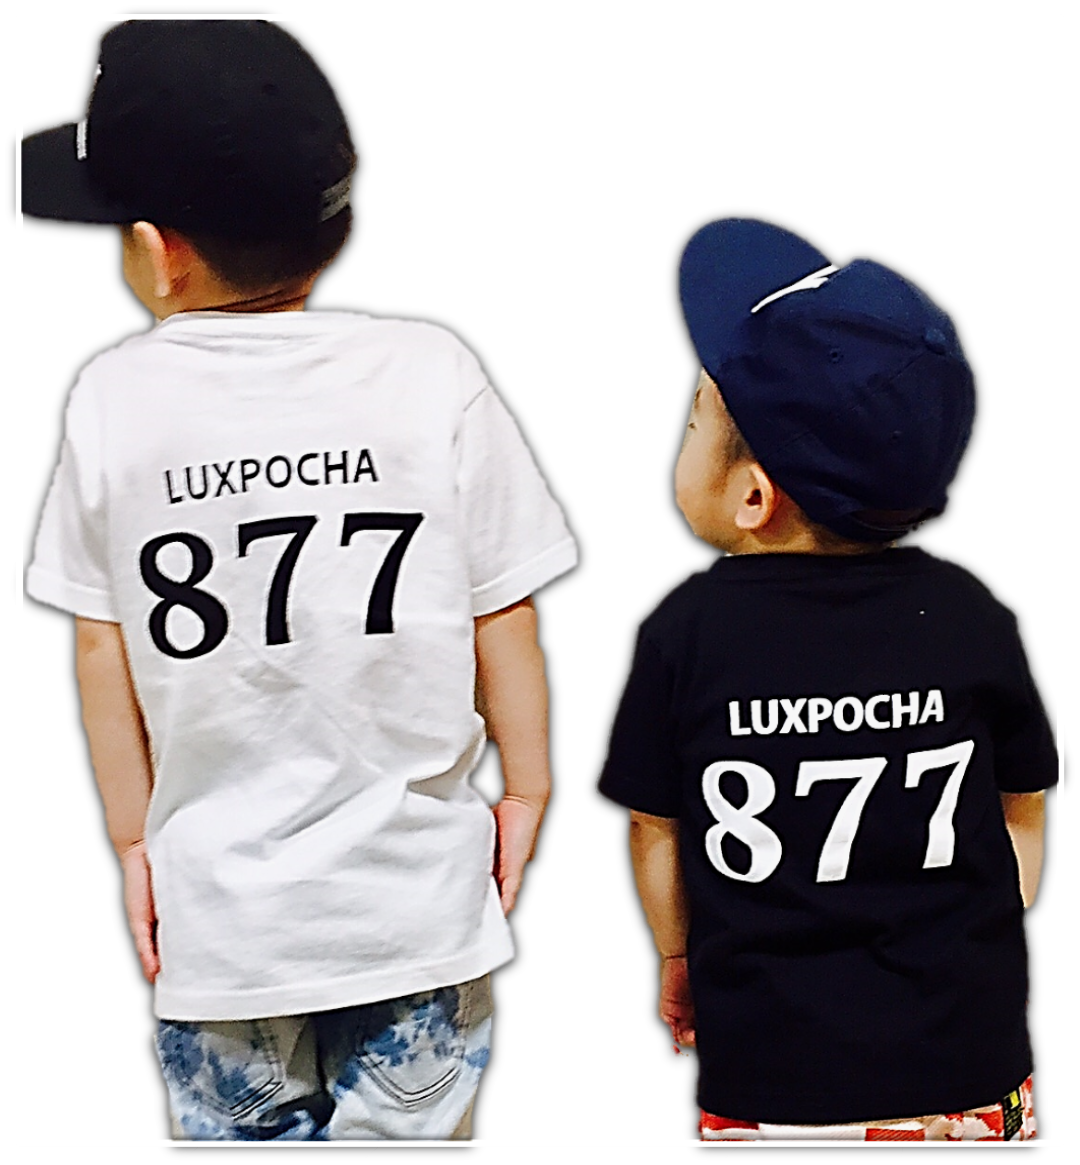 LUXPOCHA877 Kidsサイズ Tシャツブラック100cm